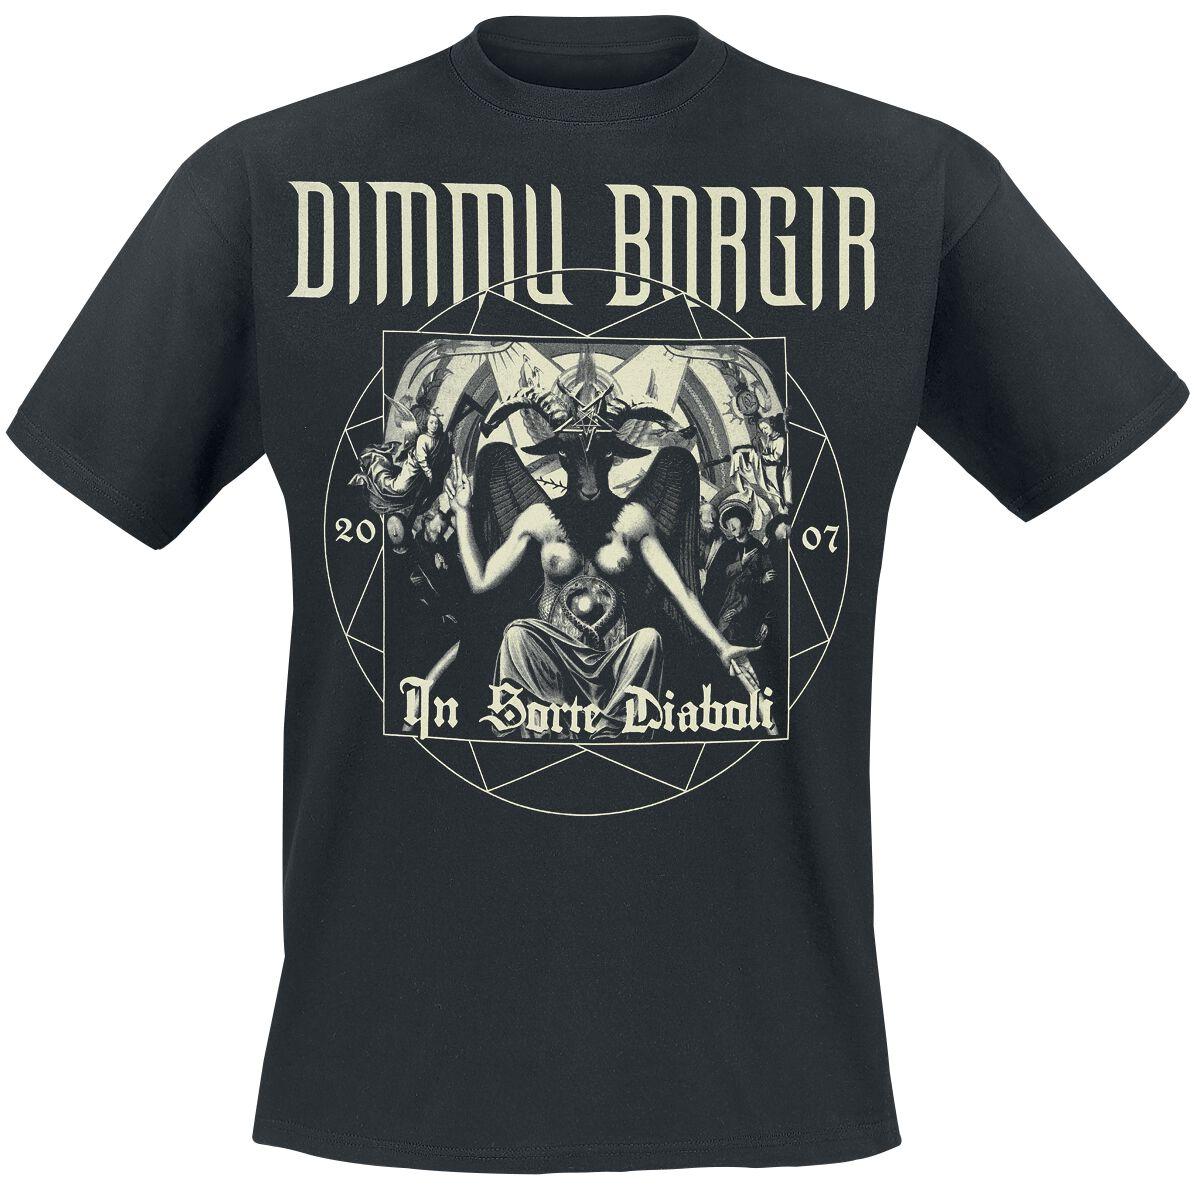 Zespoły - Koszulki - T-Shirt Dimmu Borgir In Sorte Diaboli Anniversary T-Shirt czarny - 363557